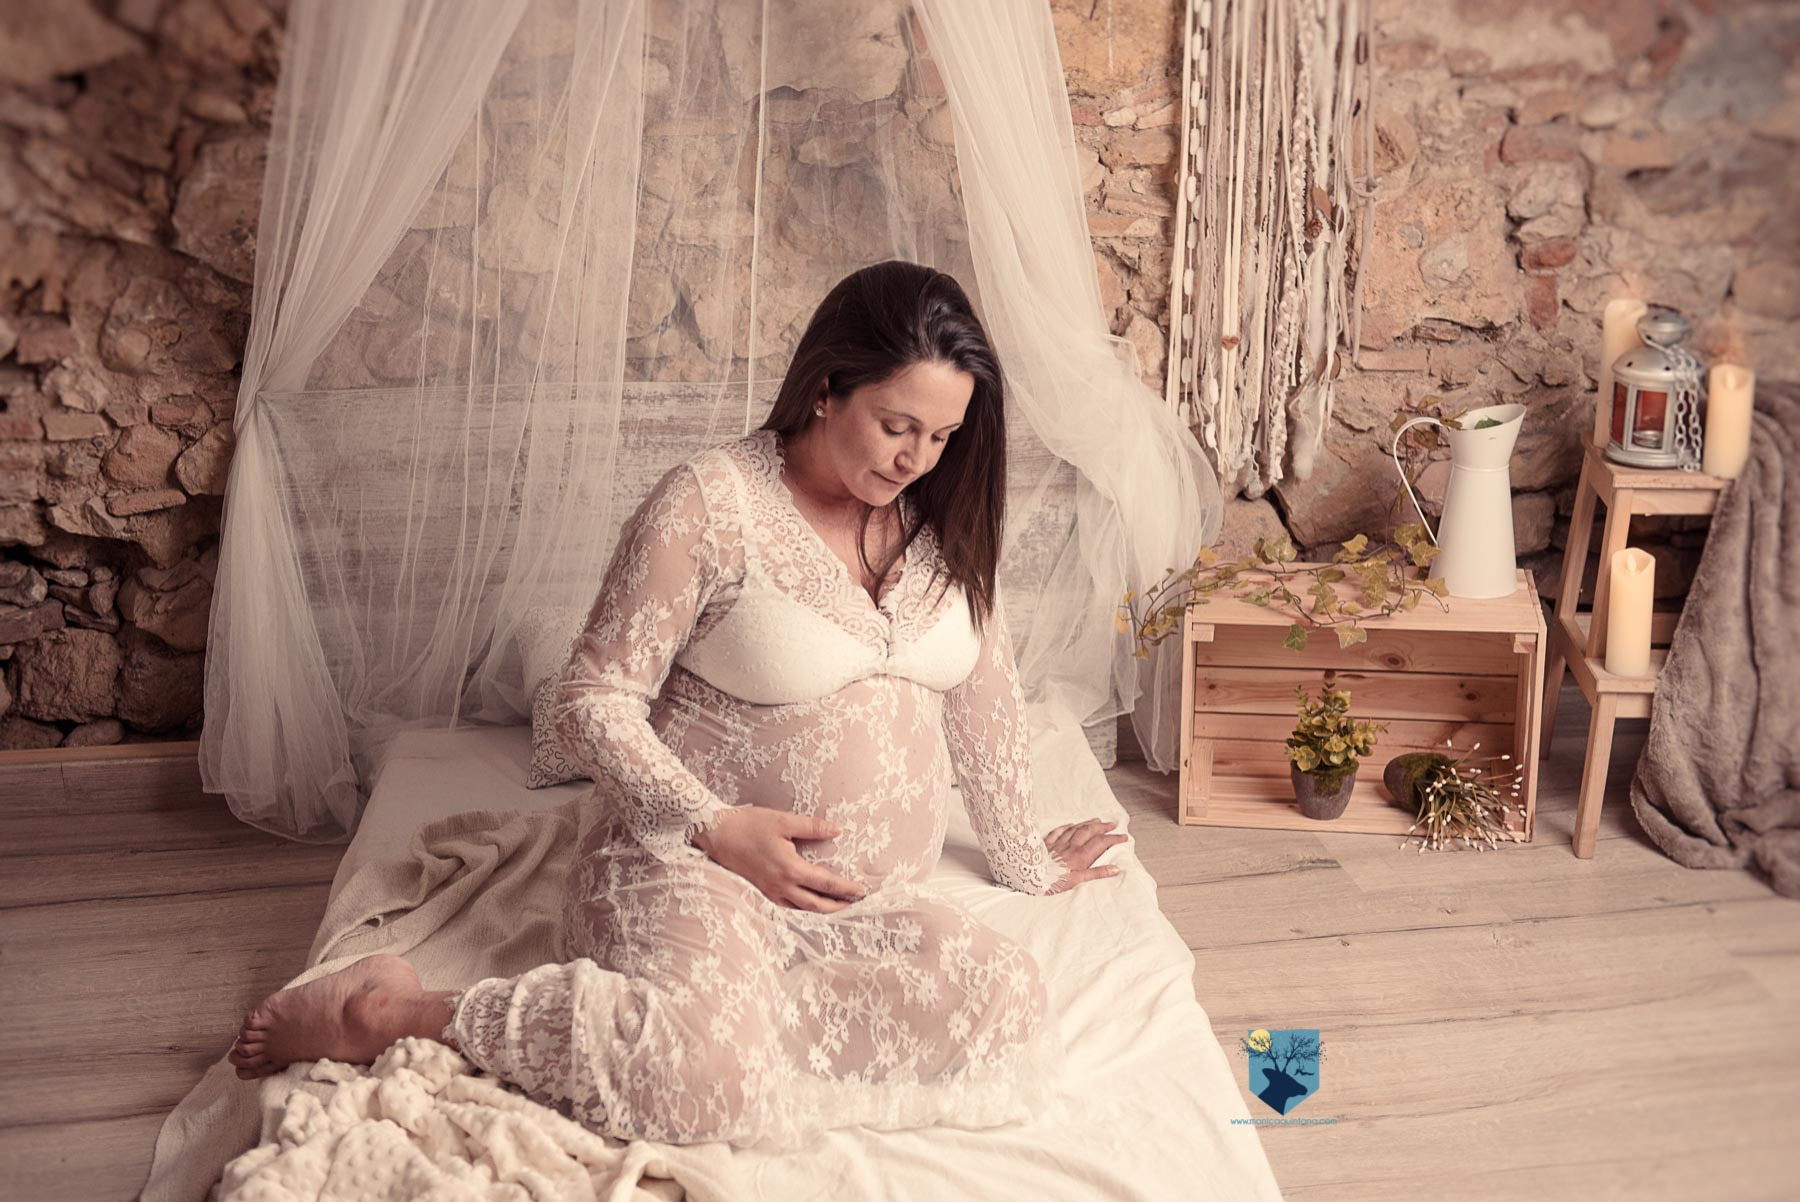 fotografia,girona,figueres,emporda,monica quintana,retrato,embarazo,embarazada,amor,pareja,familia,embaras,fotos,arcoiris